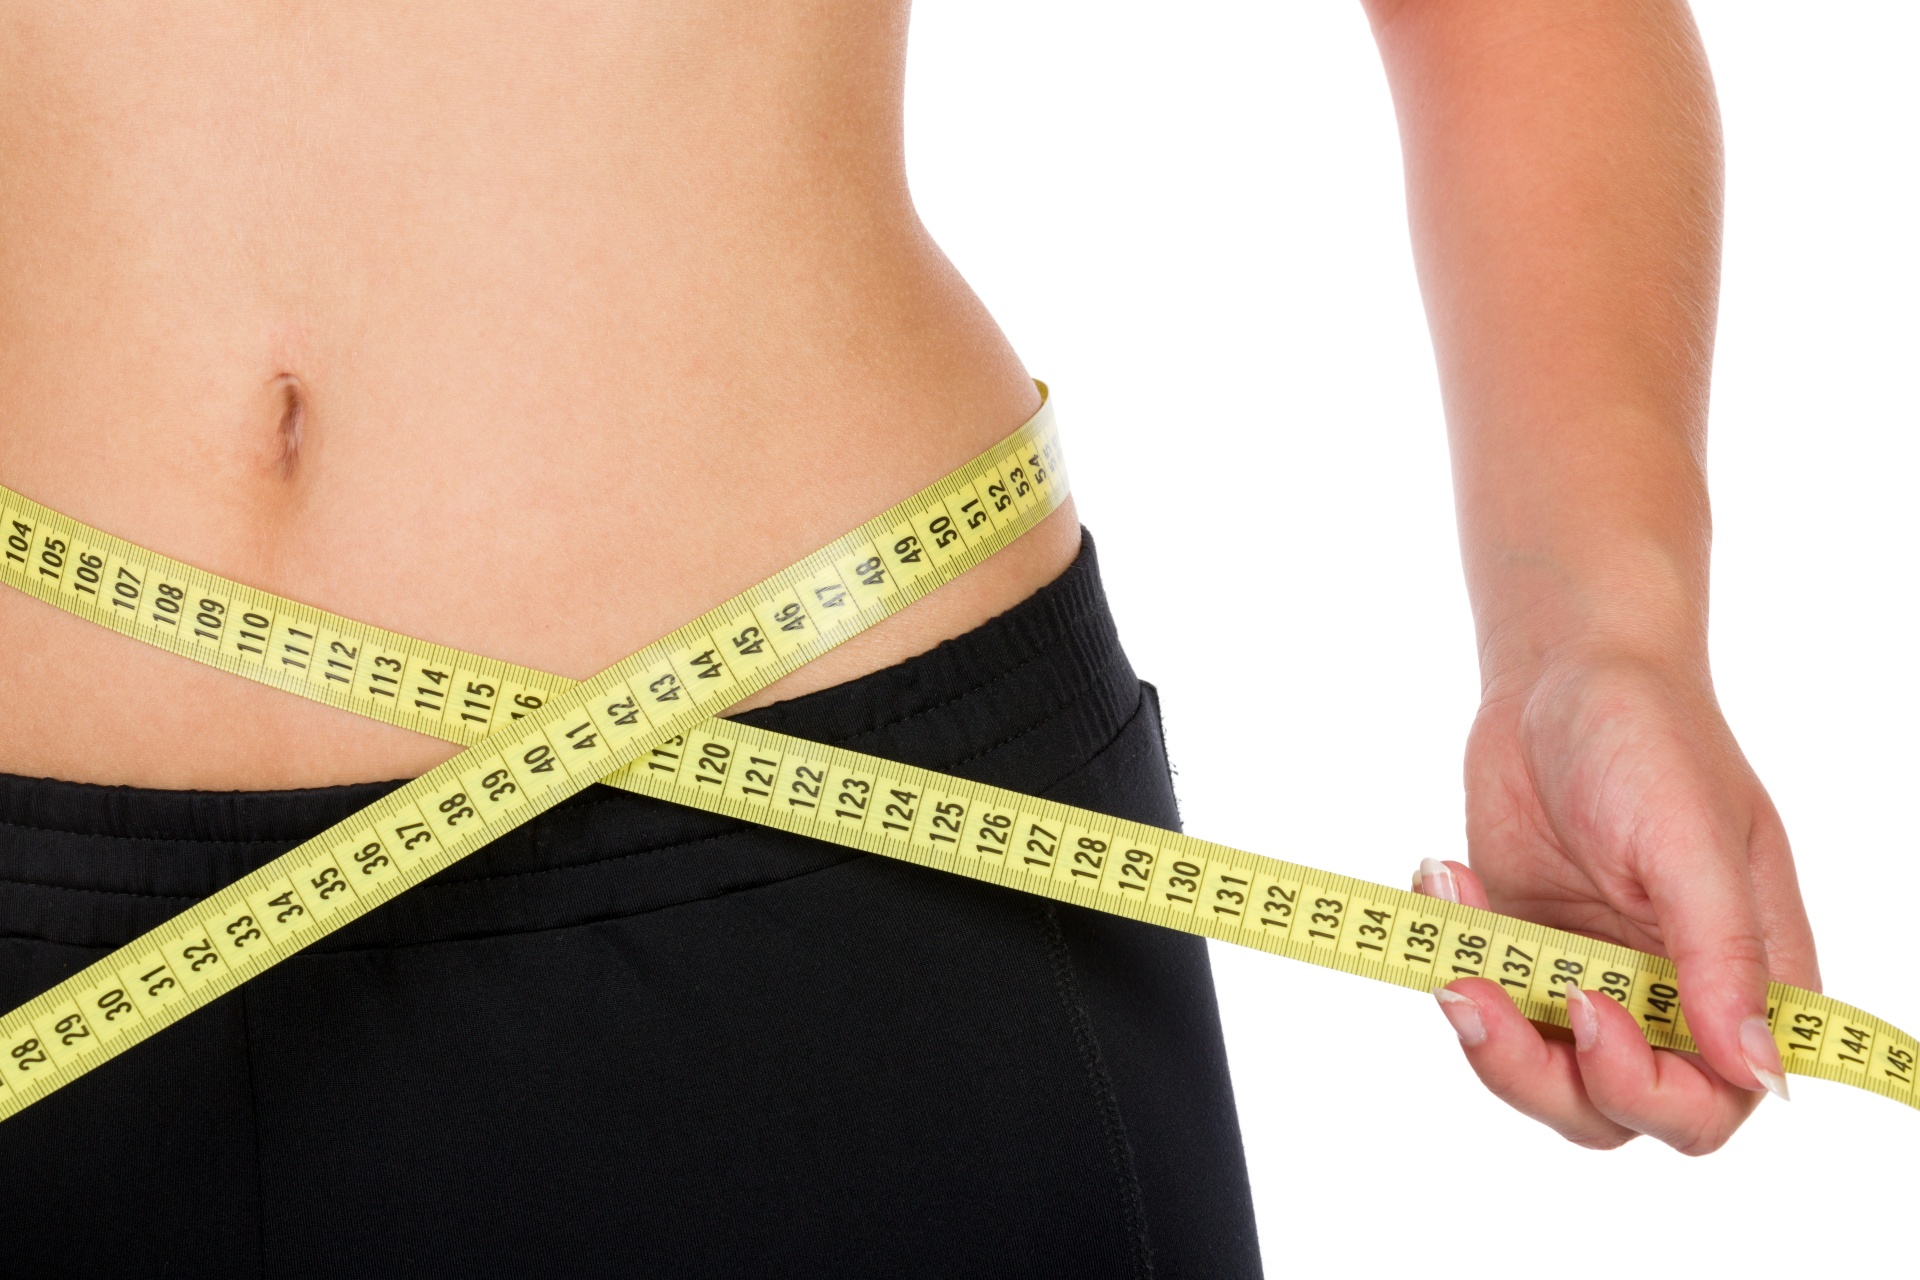 body contouring, SmartLipo, laser liposuction, cosmetic procedures